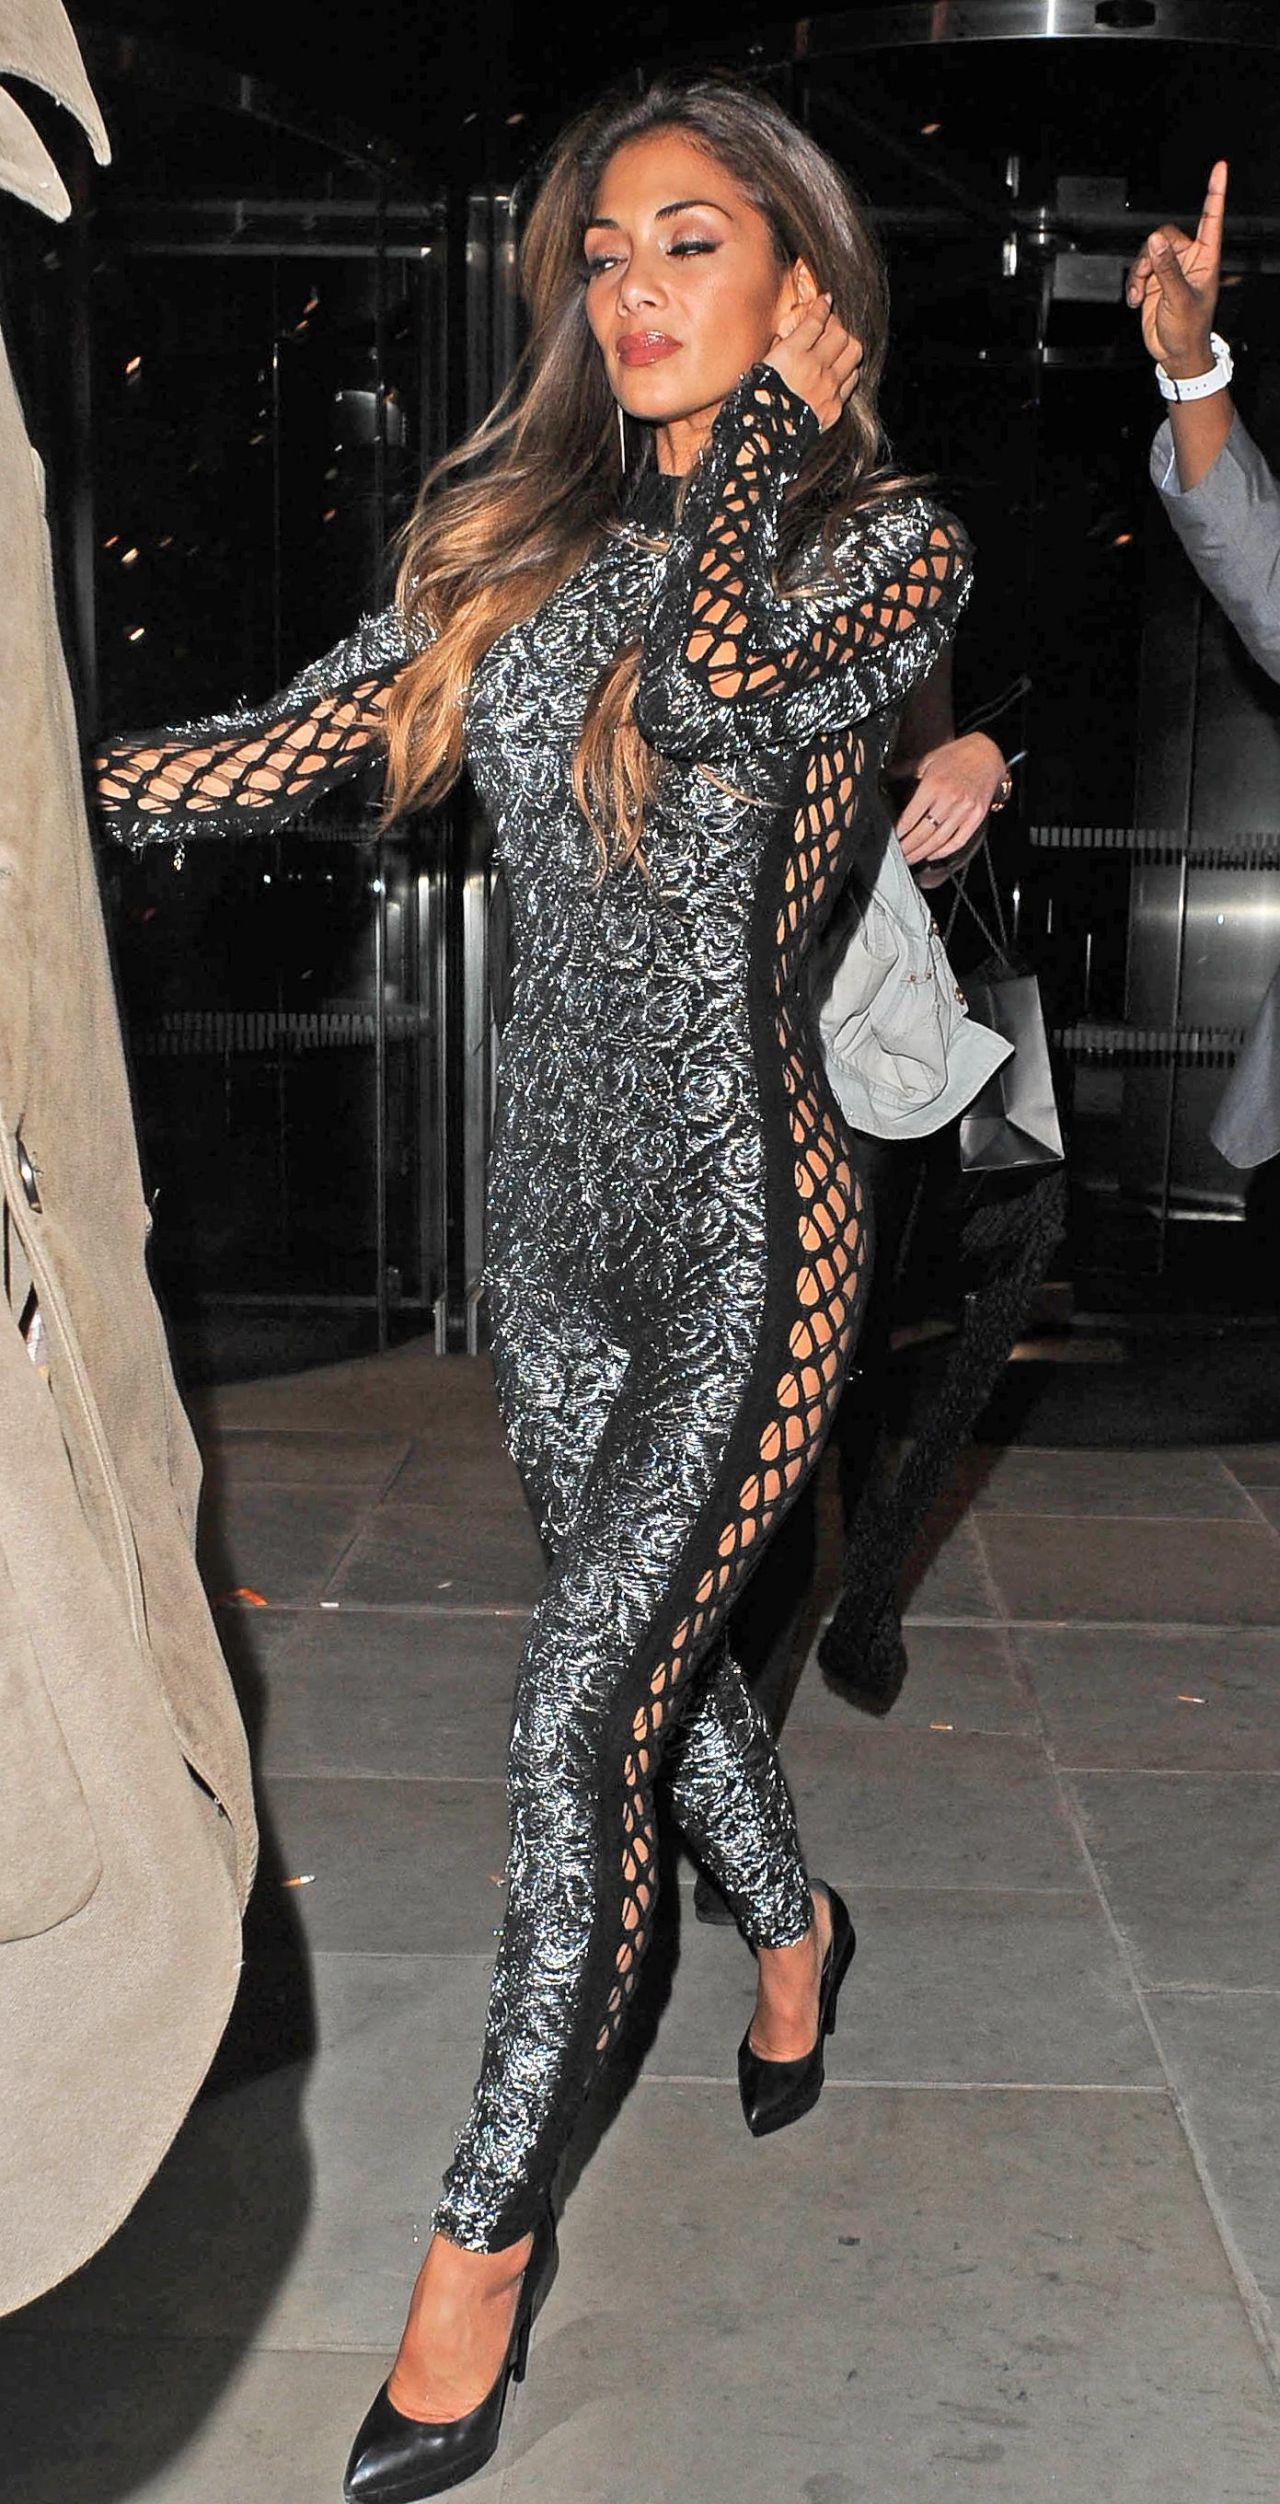 Nicole Scherzinger Shows Off Hot Body - Attending Sushi -8470